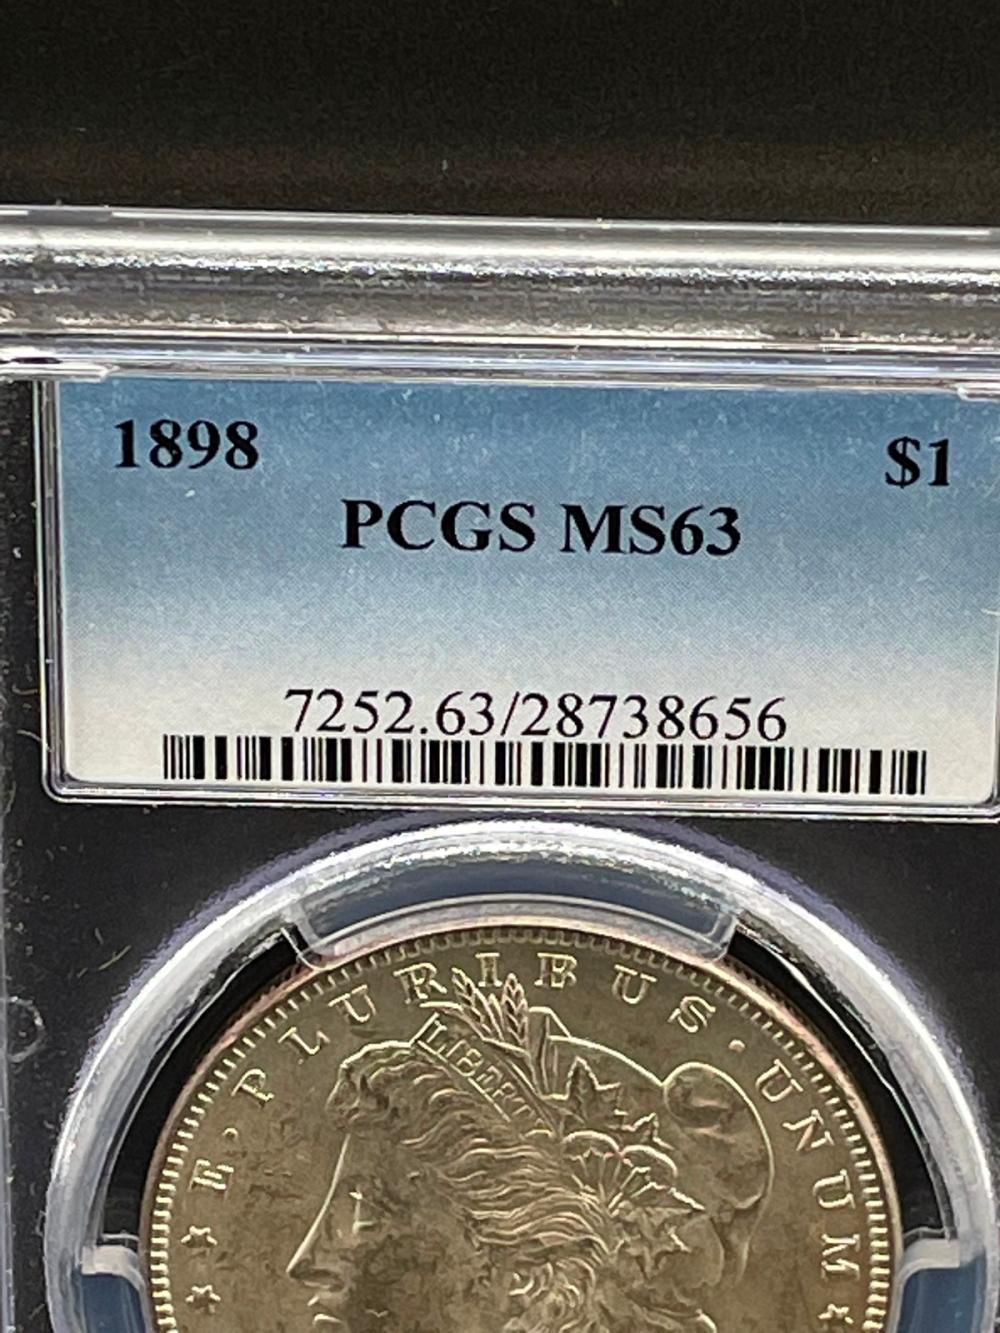 1898 Morgan Silver Dollar Graded PCGS MS63